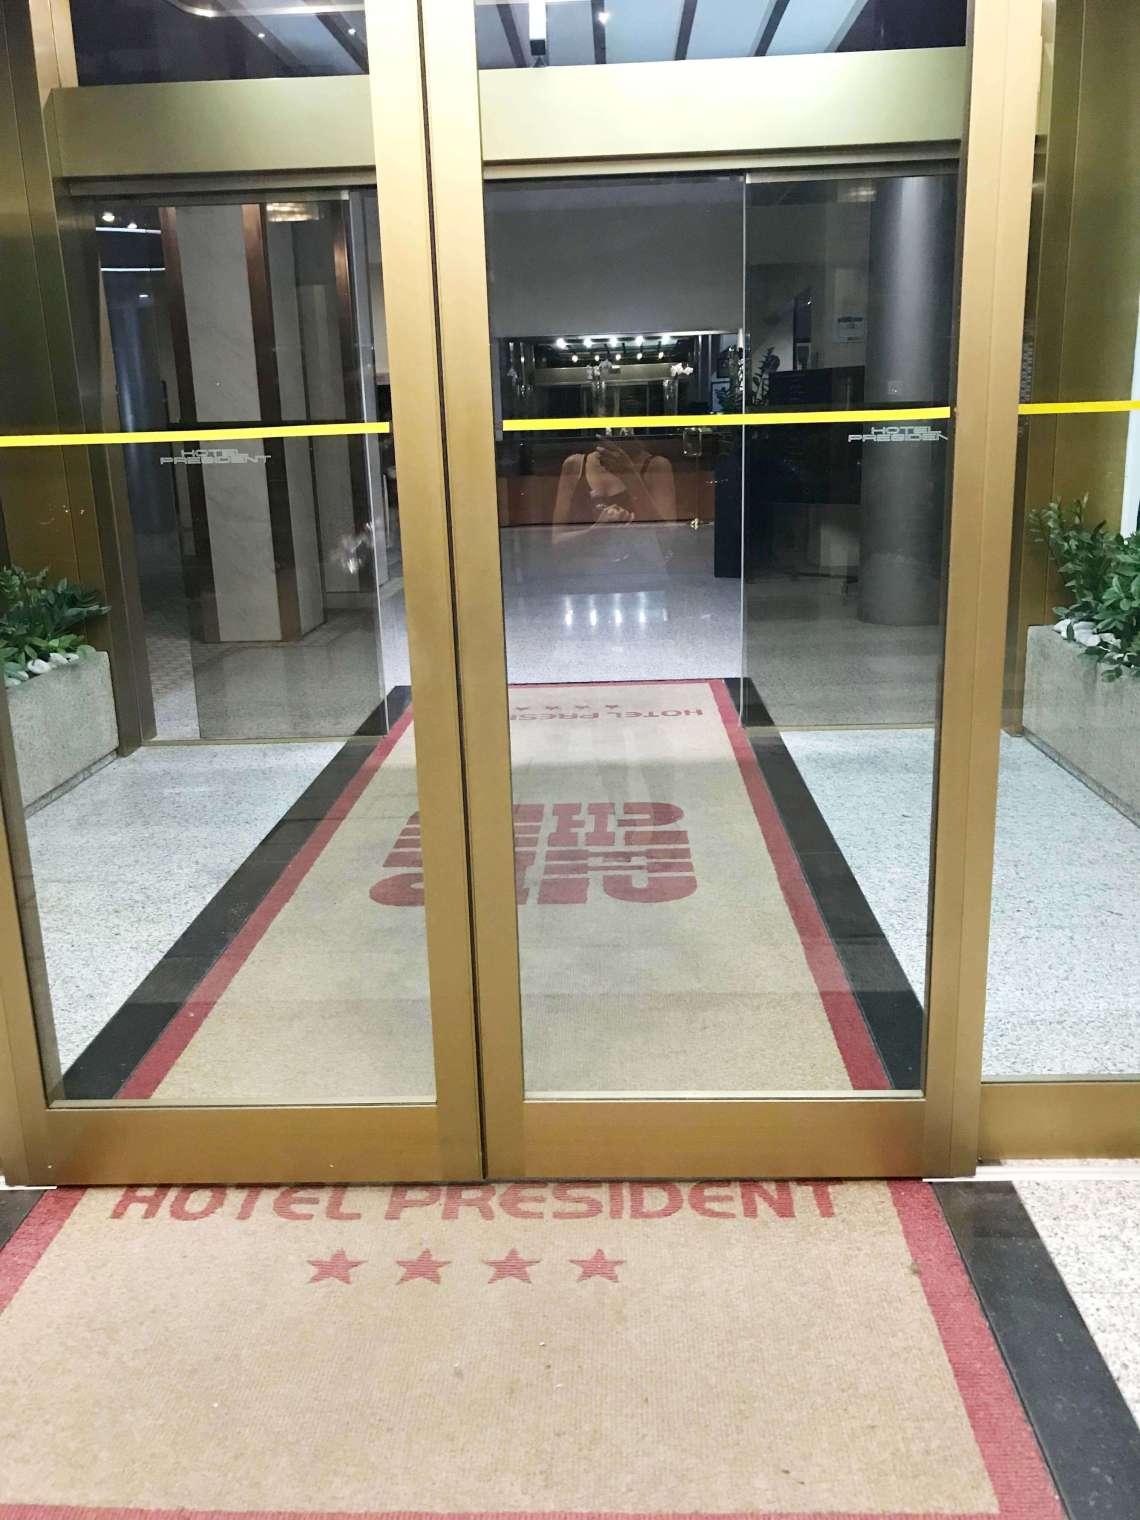 hotel-president1